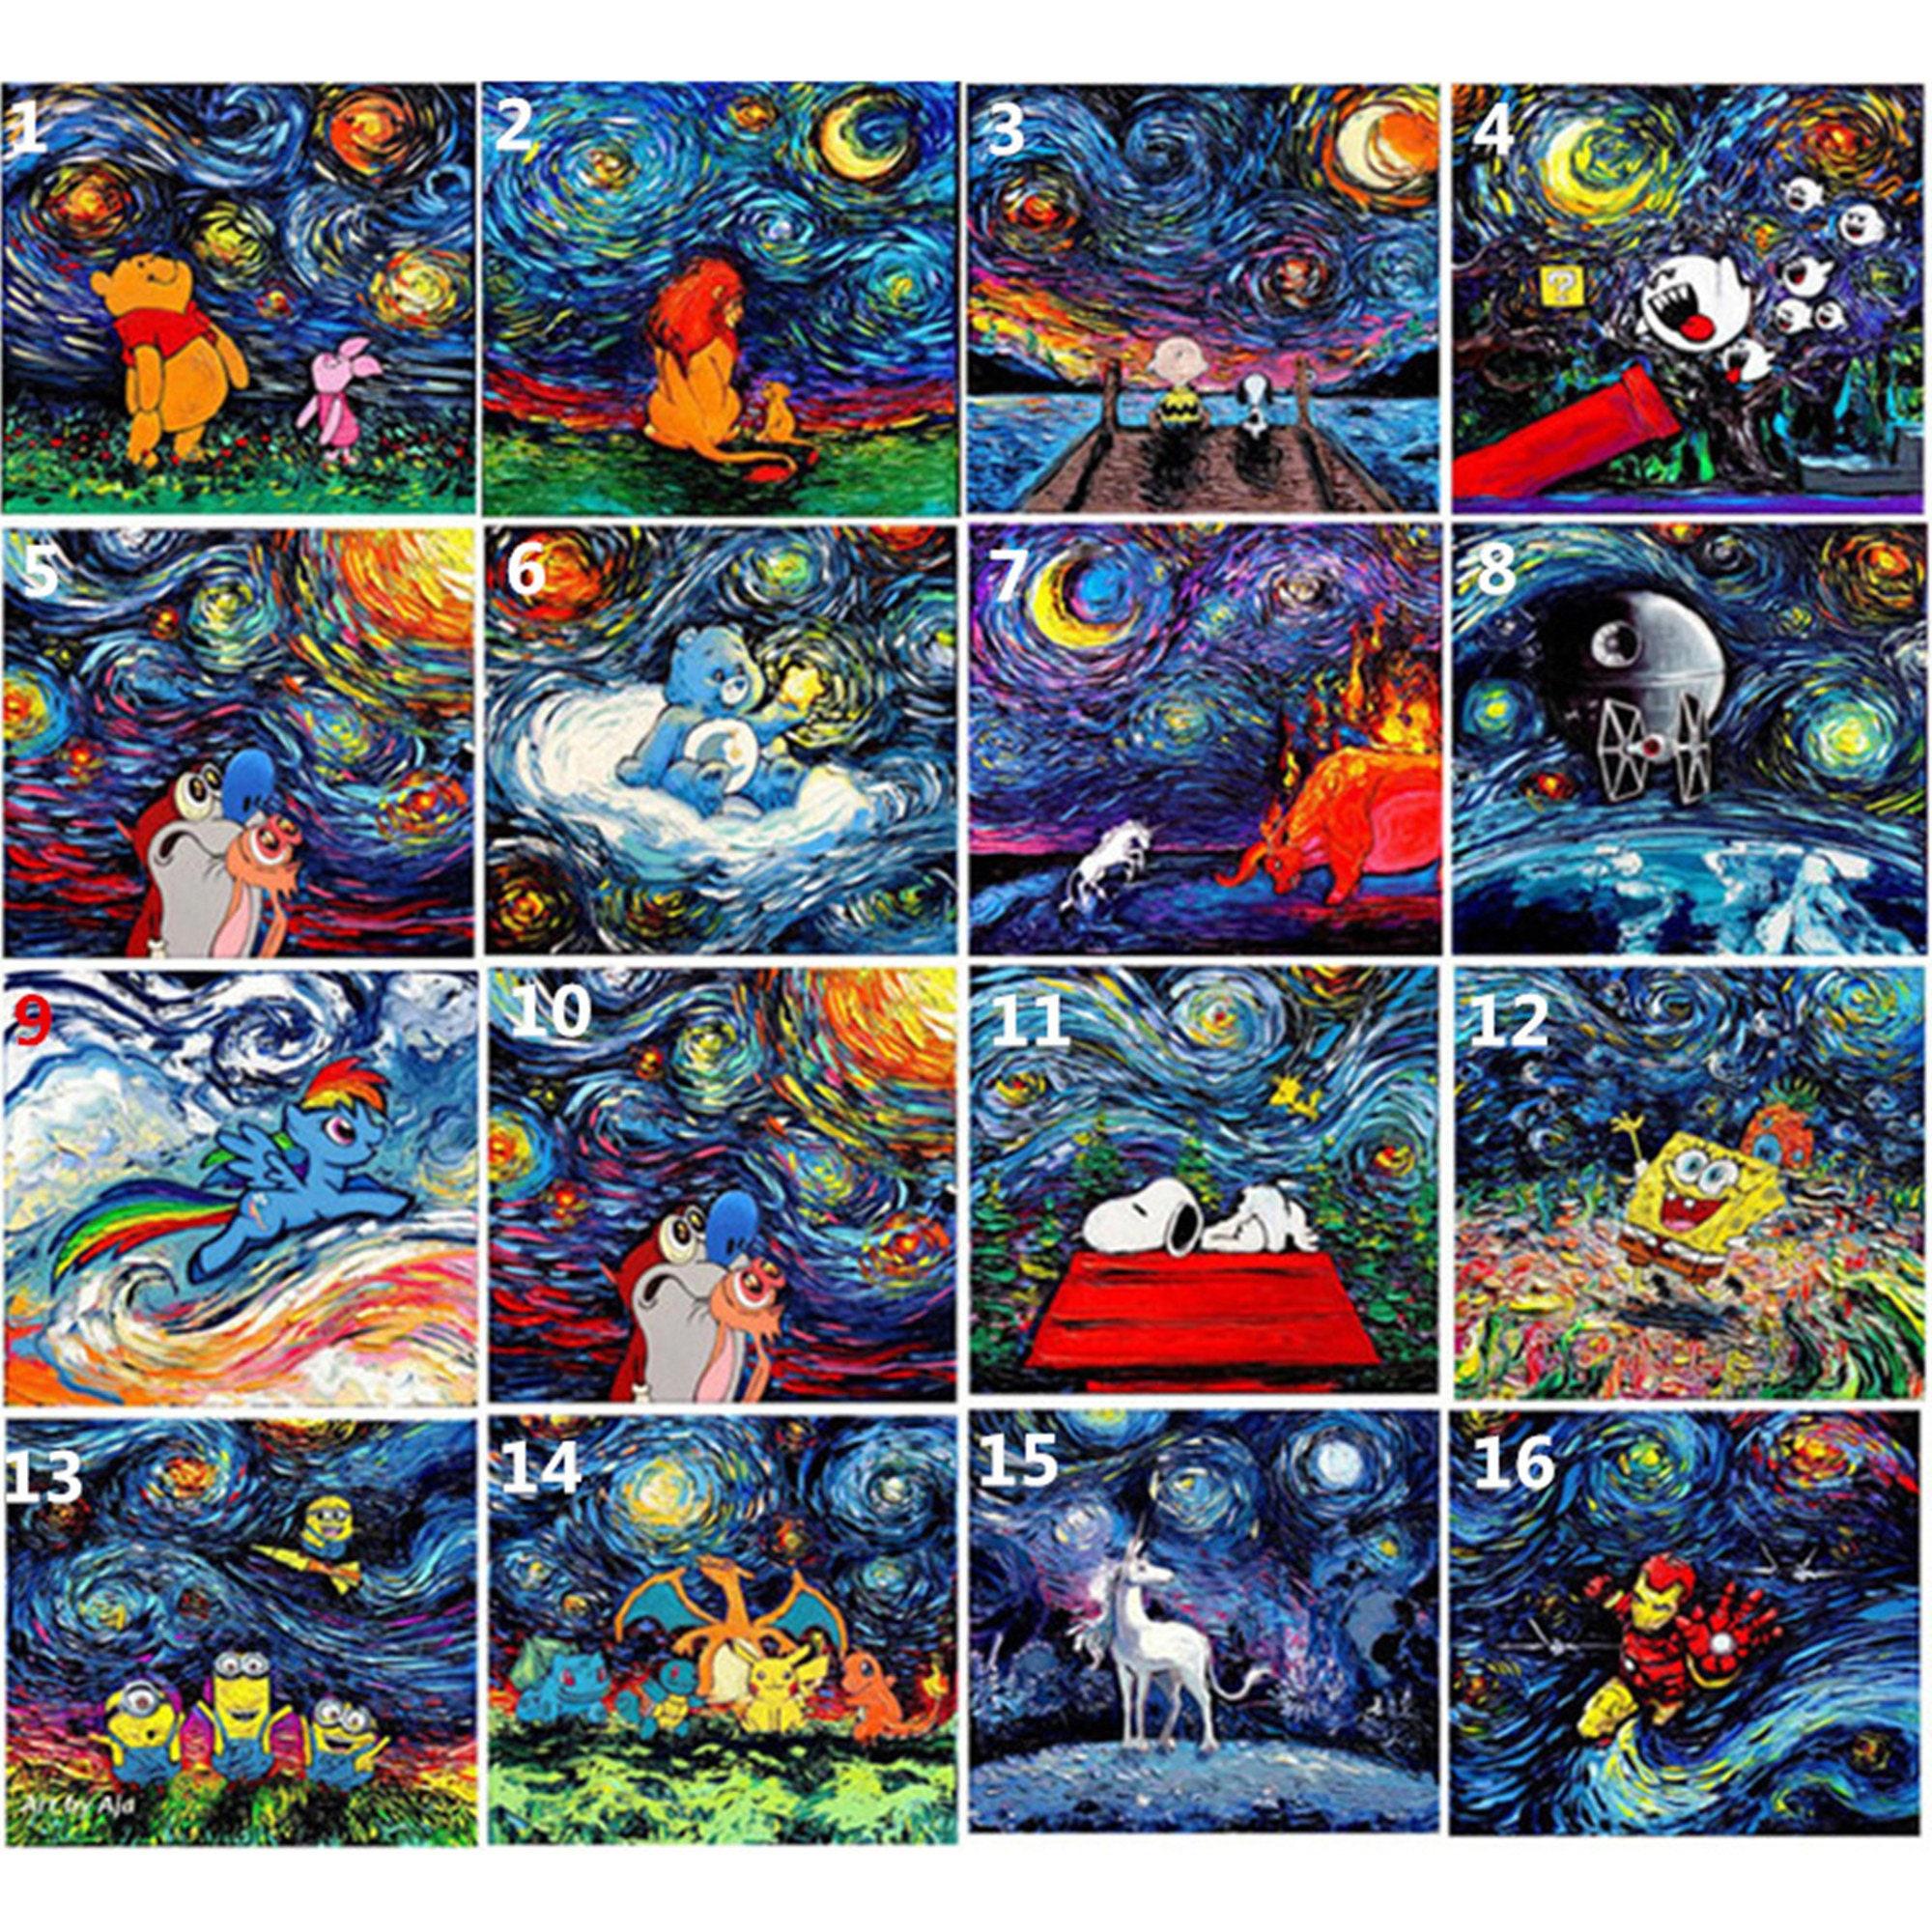 Moon Starry Full Drill 5D Diamond Painting DIY Cross Stitch Kits Home Mosaic Art